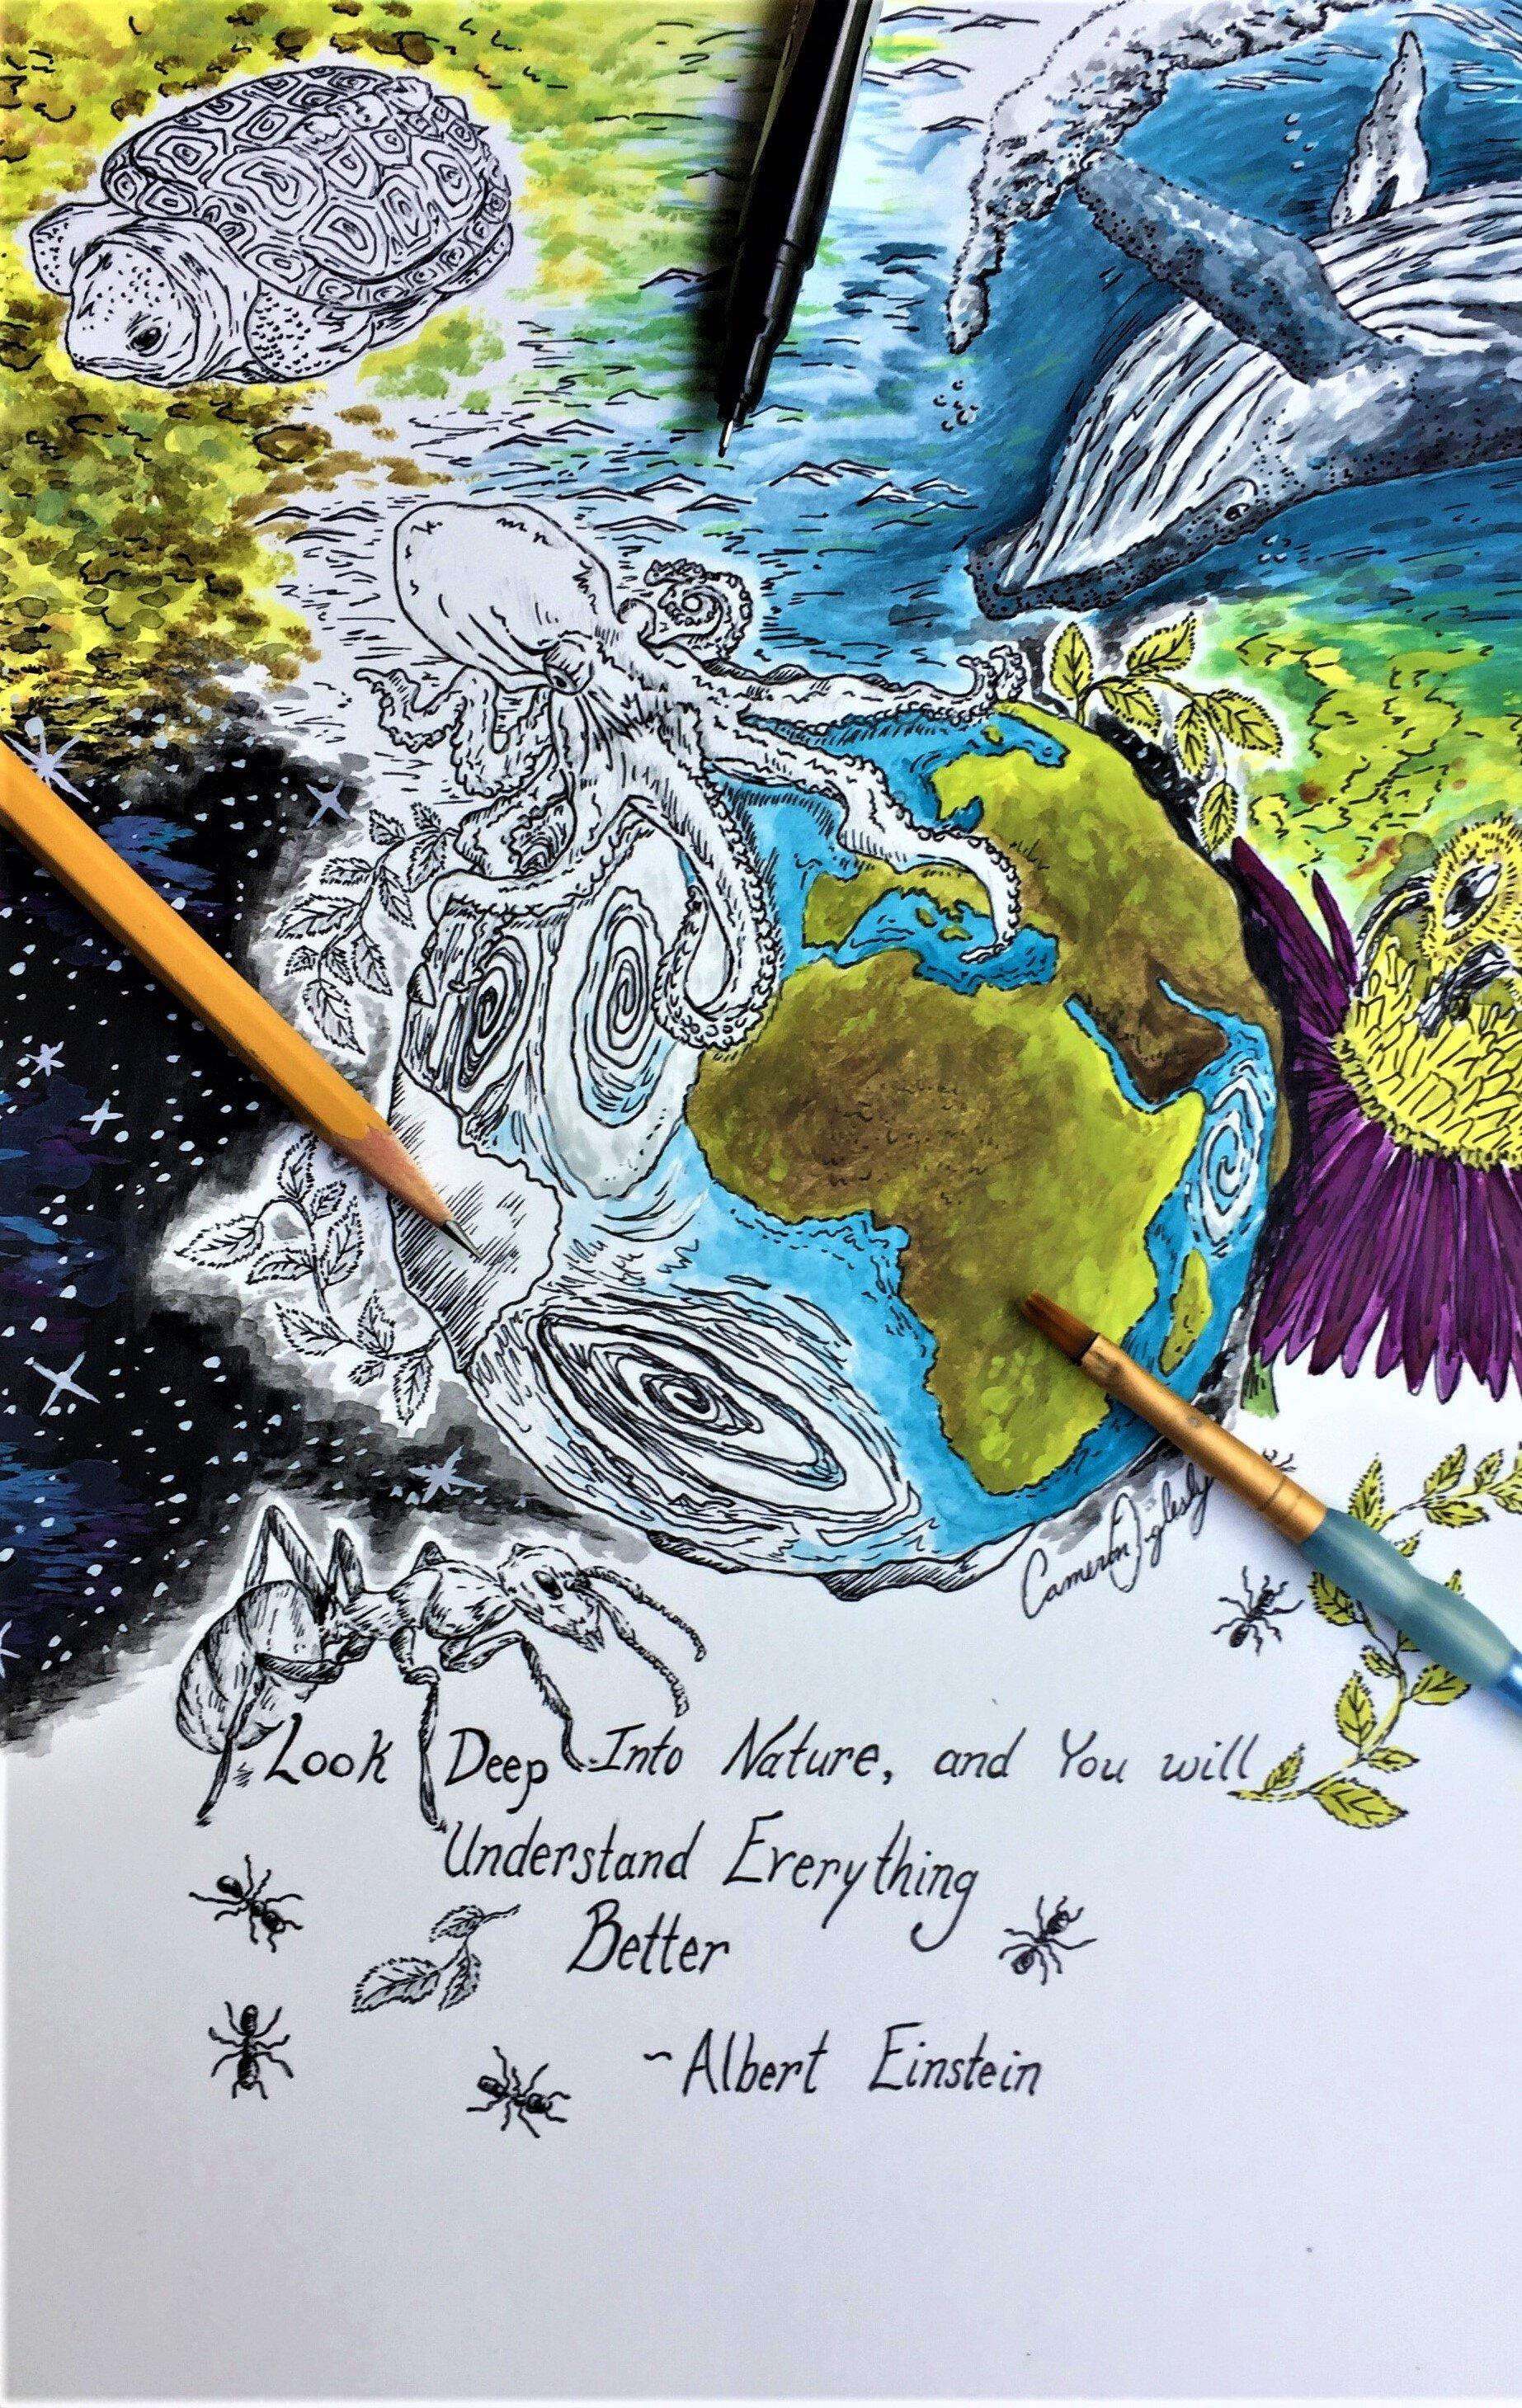 Oglesby_My Little Earth_October - Cameron Oglesby.jpg